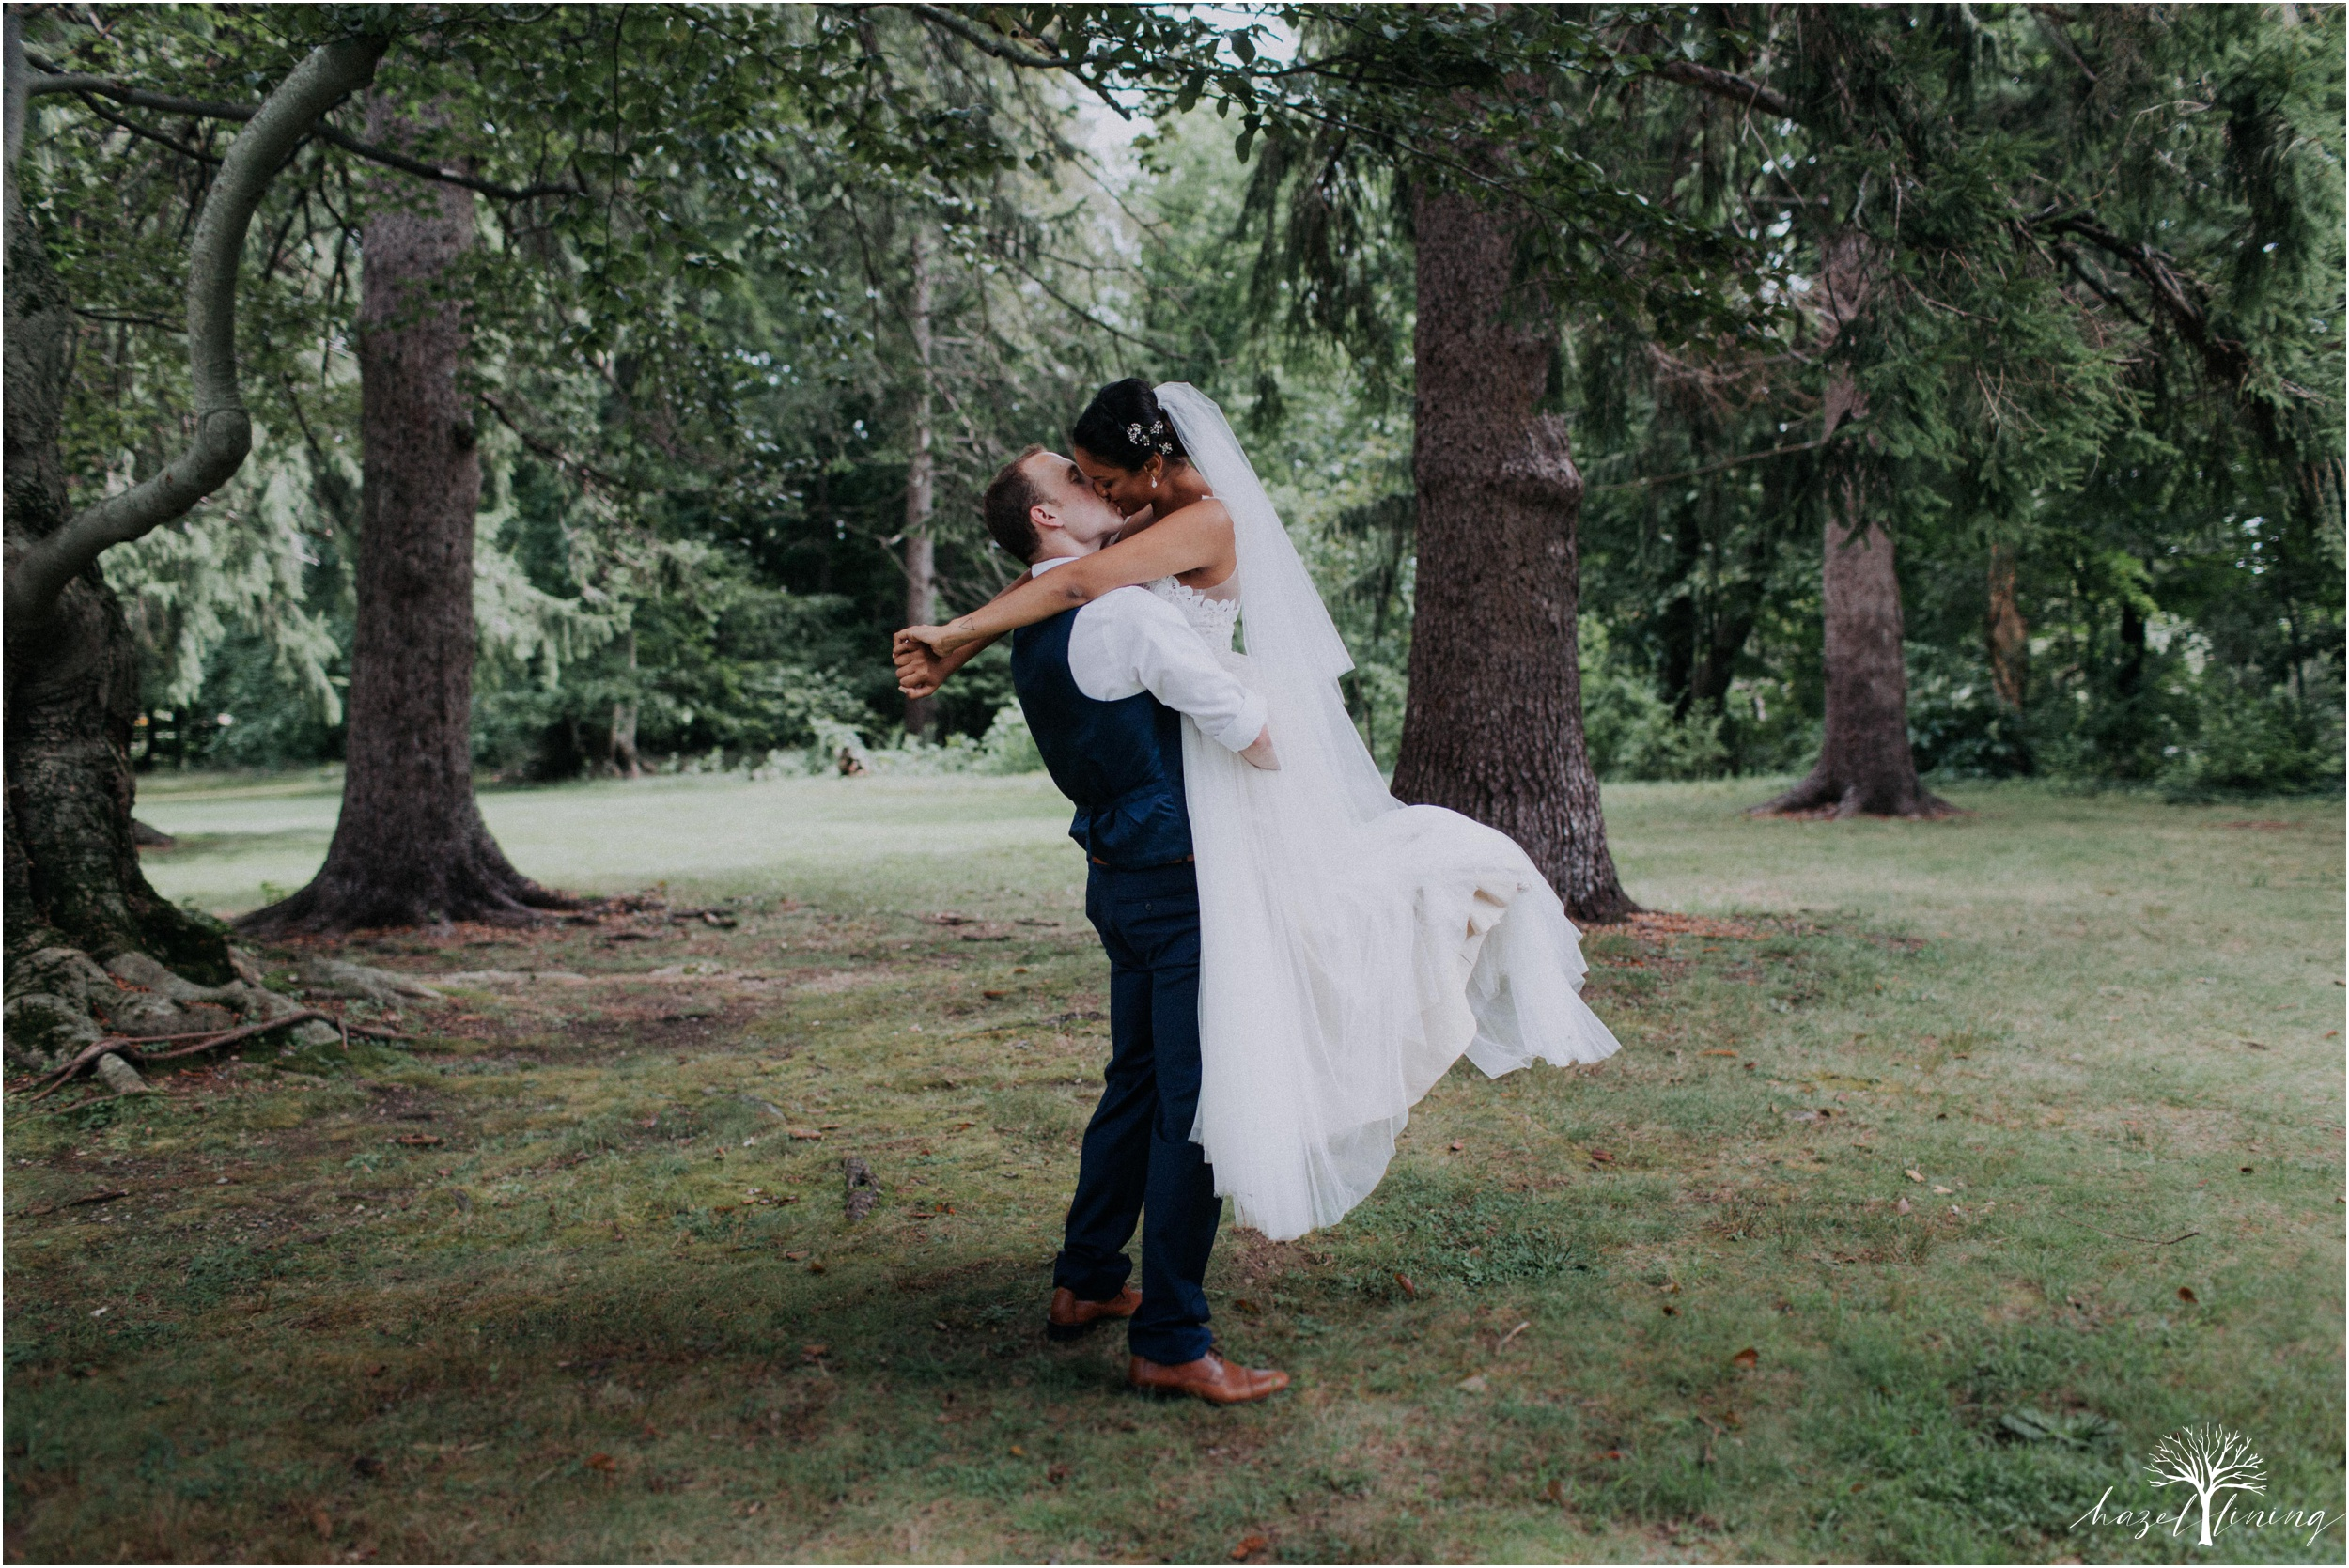 mariah-kreyling-samuel-sherratt-sherrattwiththeworld-peirce-farm-at-witch-hill-boston-massachusetts-wedding-photography-hazel-lining-travel-wedding-elopement-photography_0124.jpg